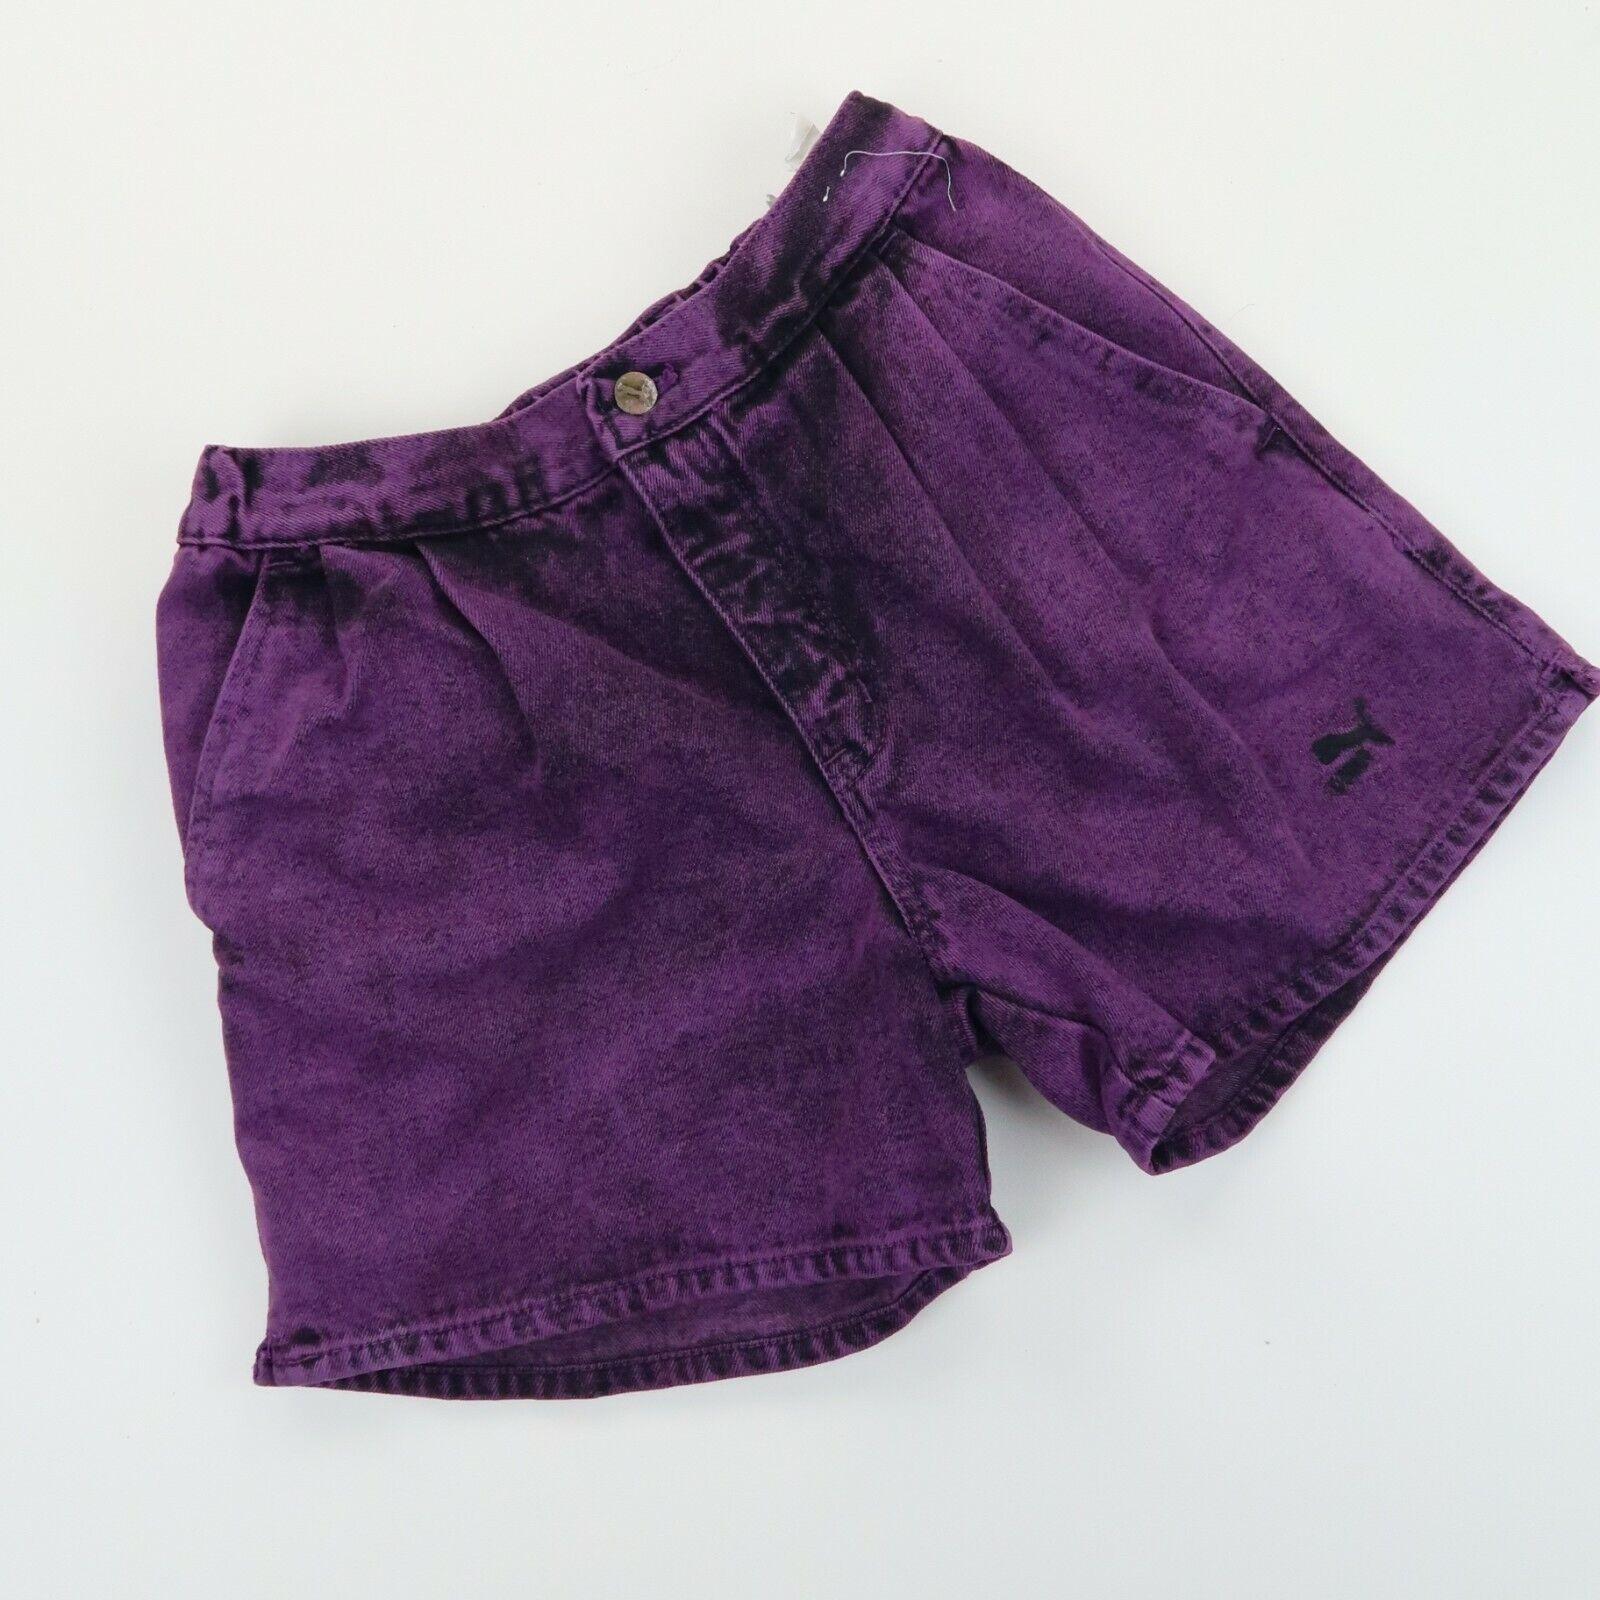 PUMA Vintage 90's Womens High waisted denim Acid Wash shorts SZ 29